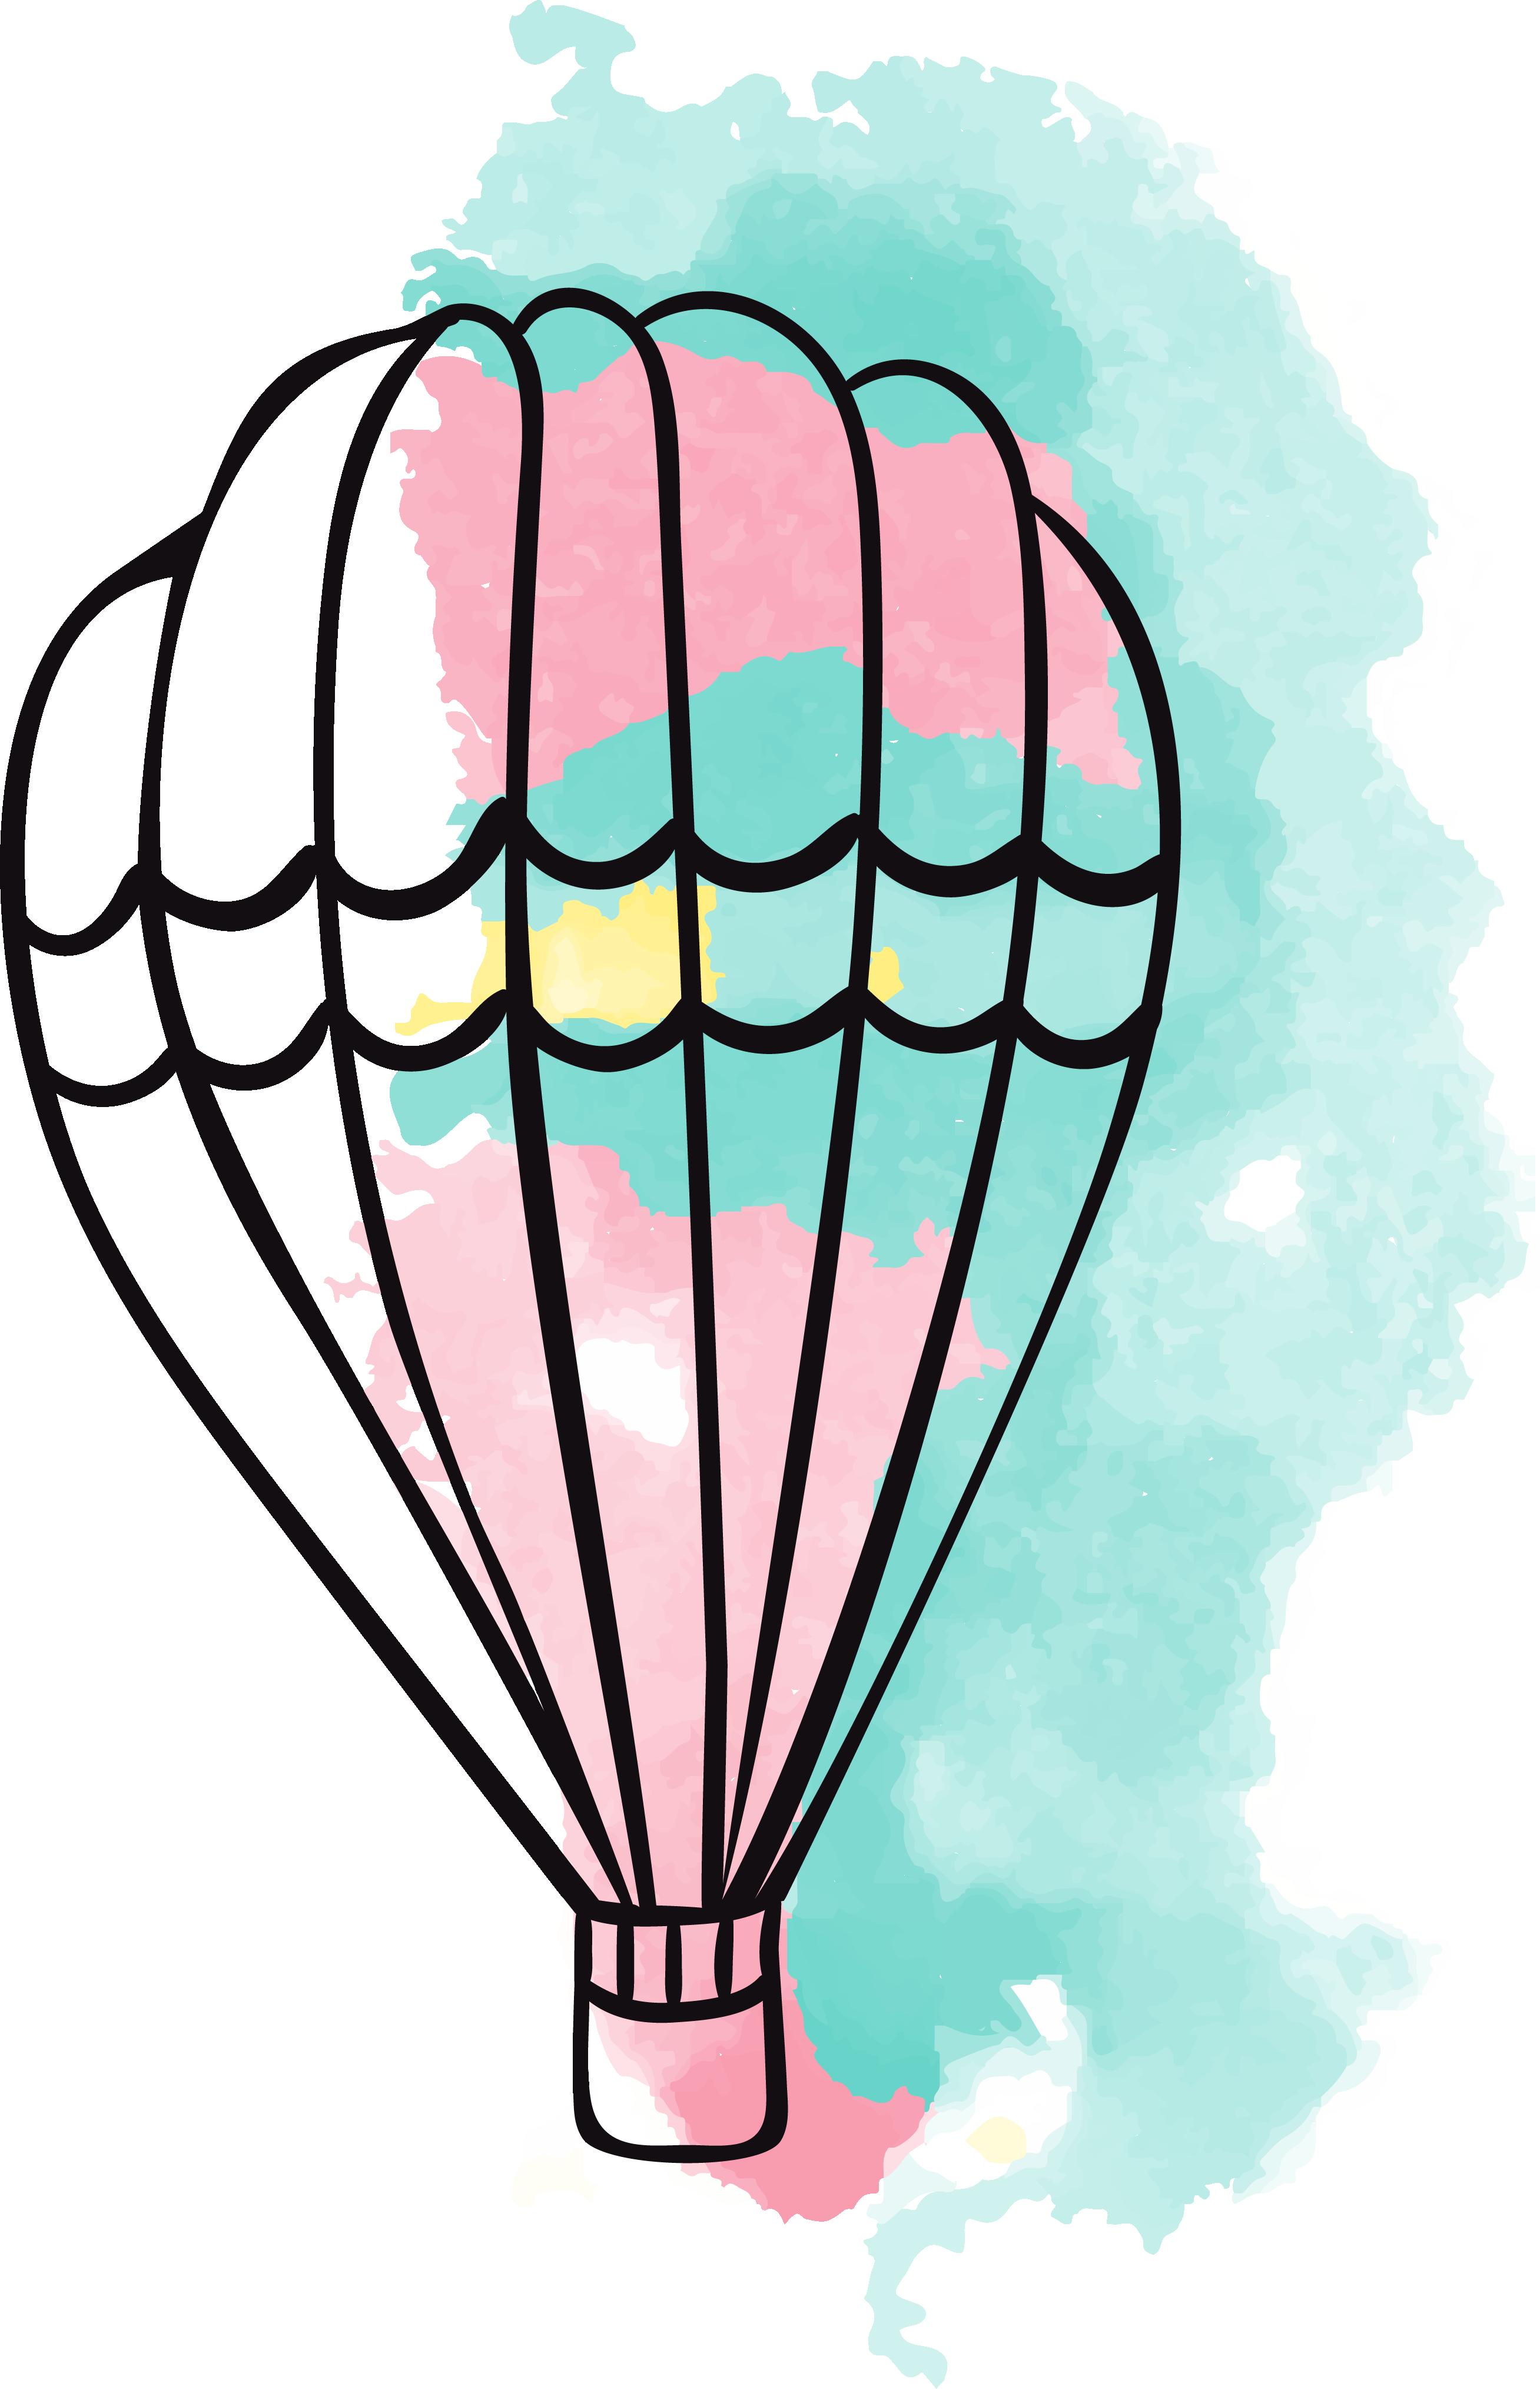 Donut clipart watercolor. Airplane hot air balloon